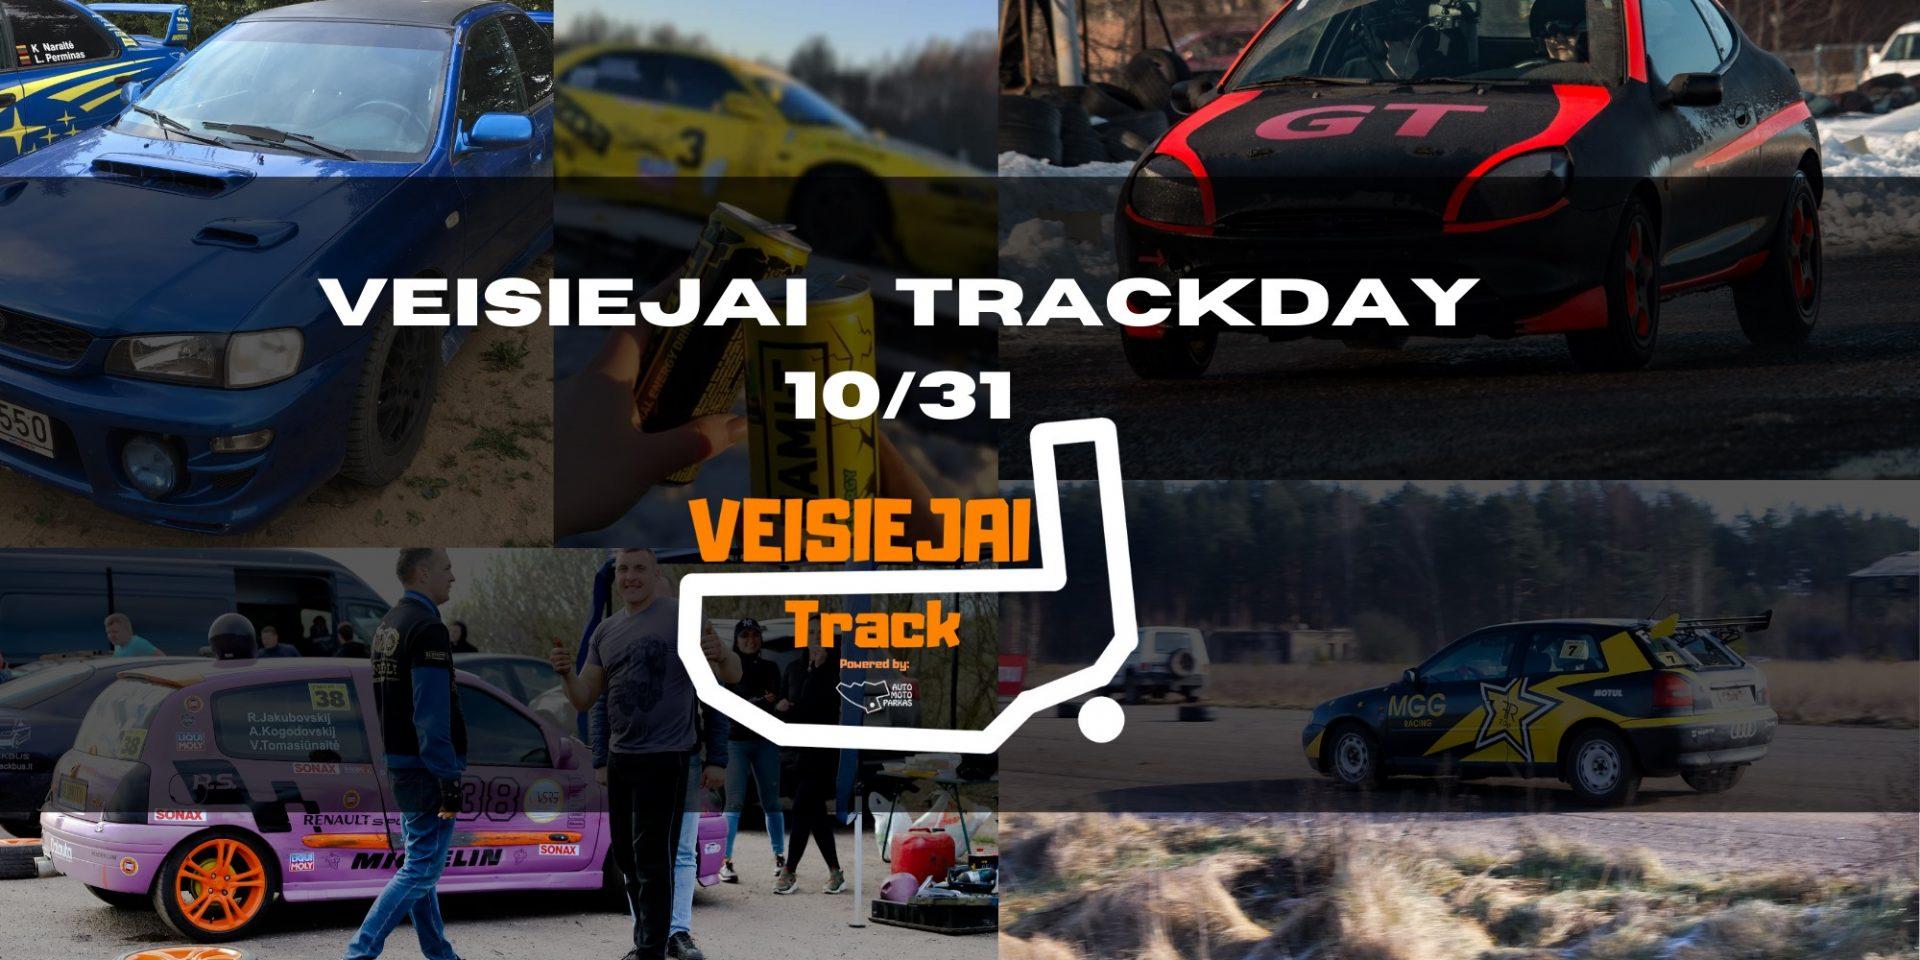 Veisiejai Trackday